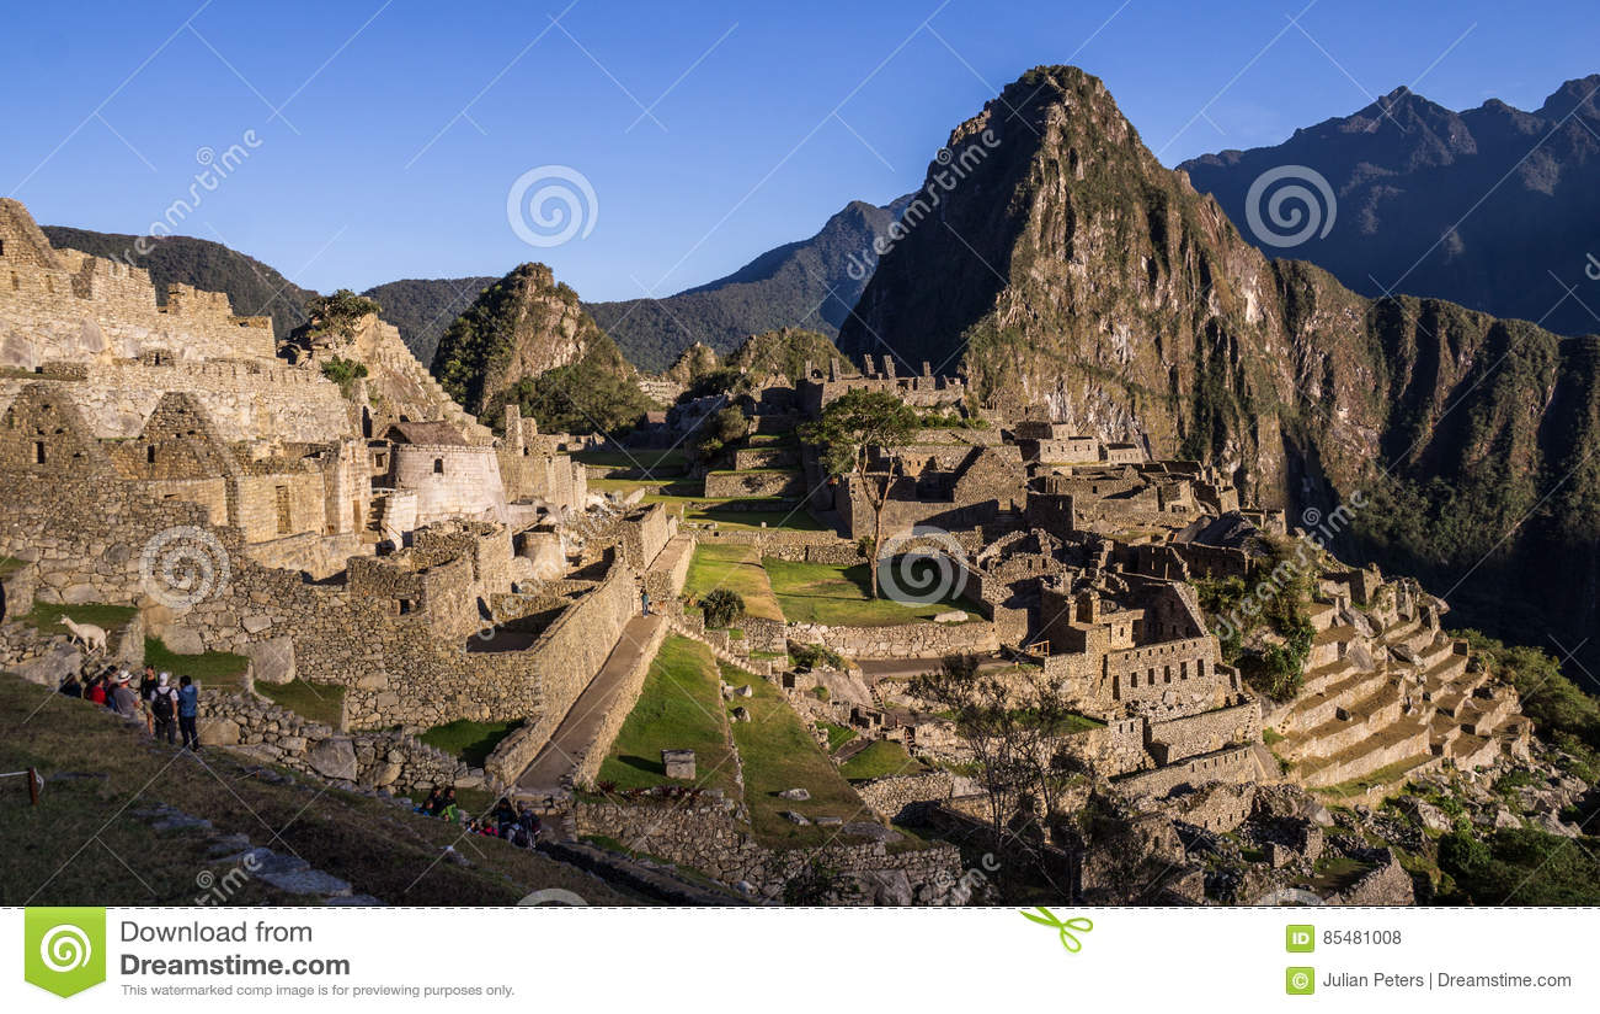 Inkastadt Machu Picchu, Peru bei Sonnenaufgang